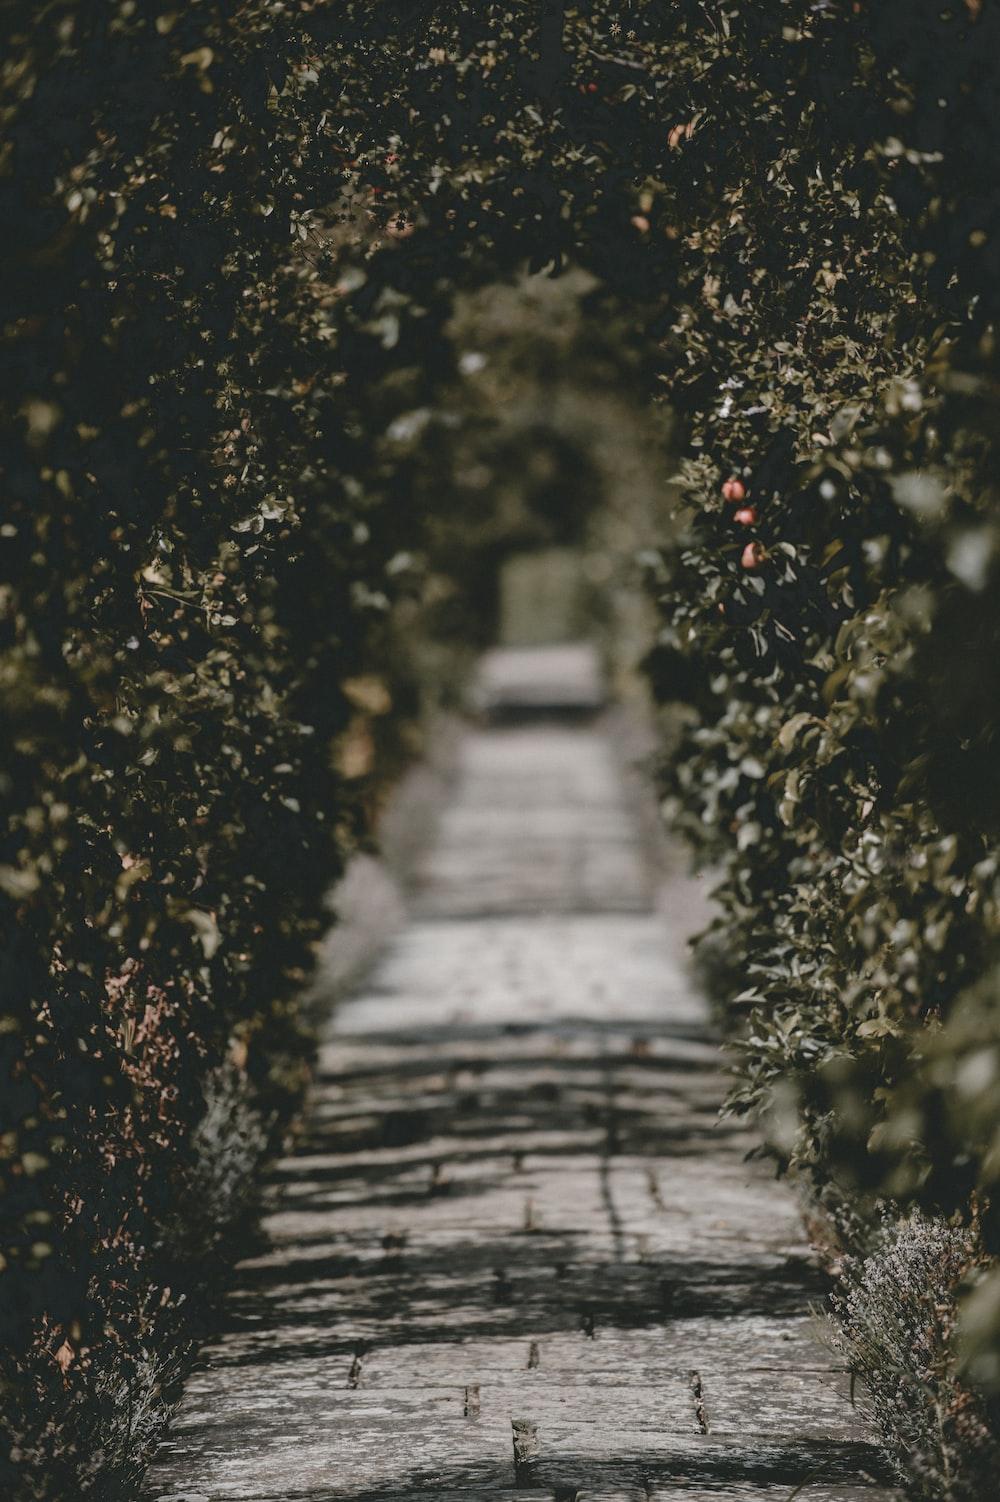 gray road between green leafed bush